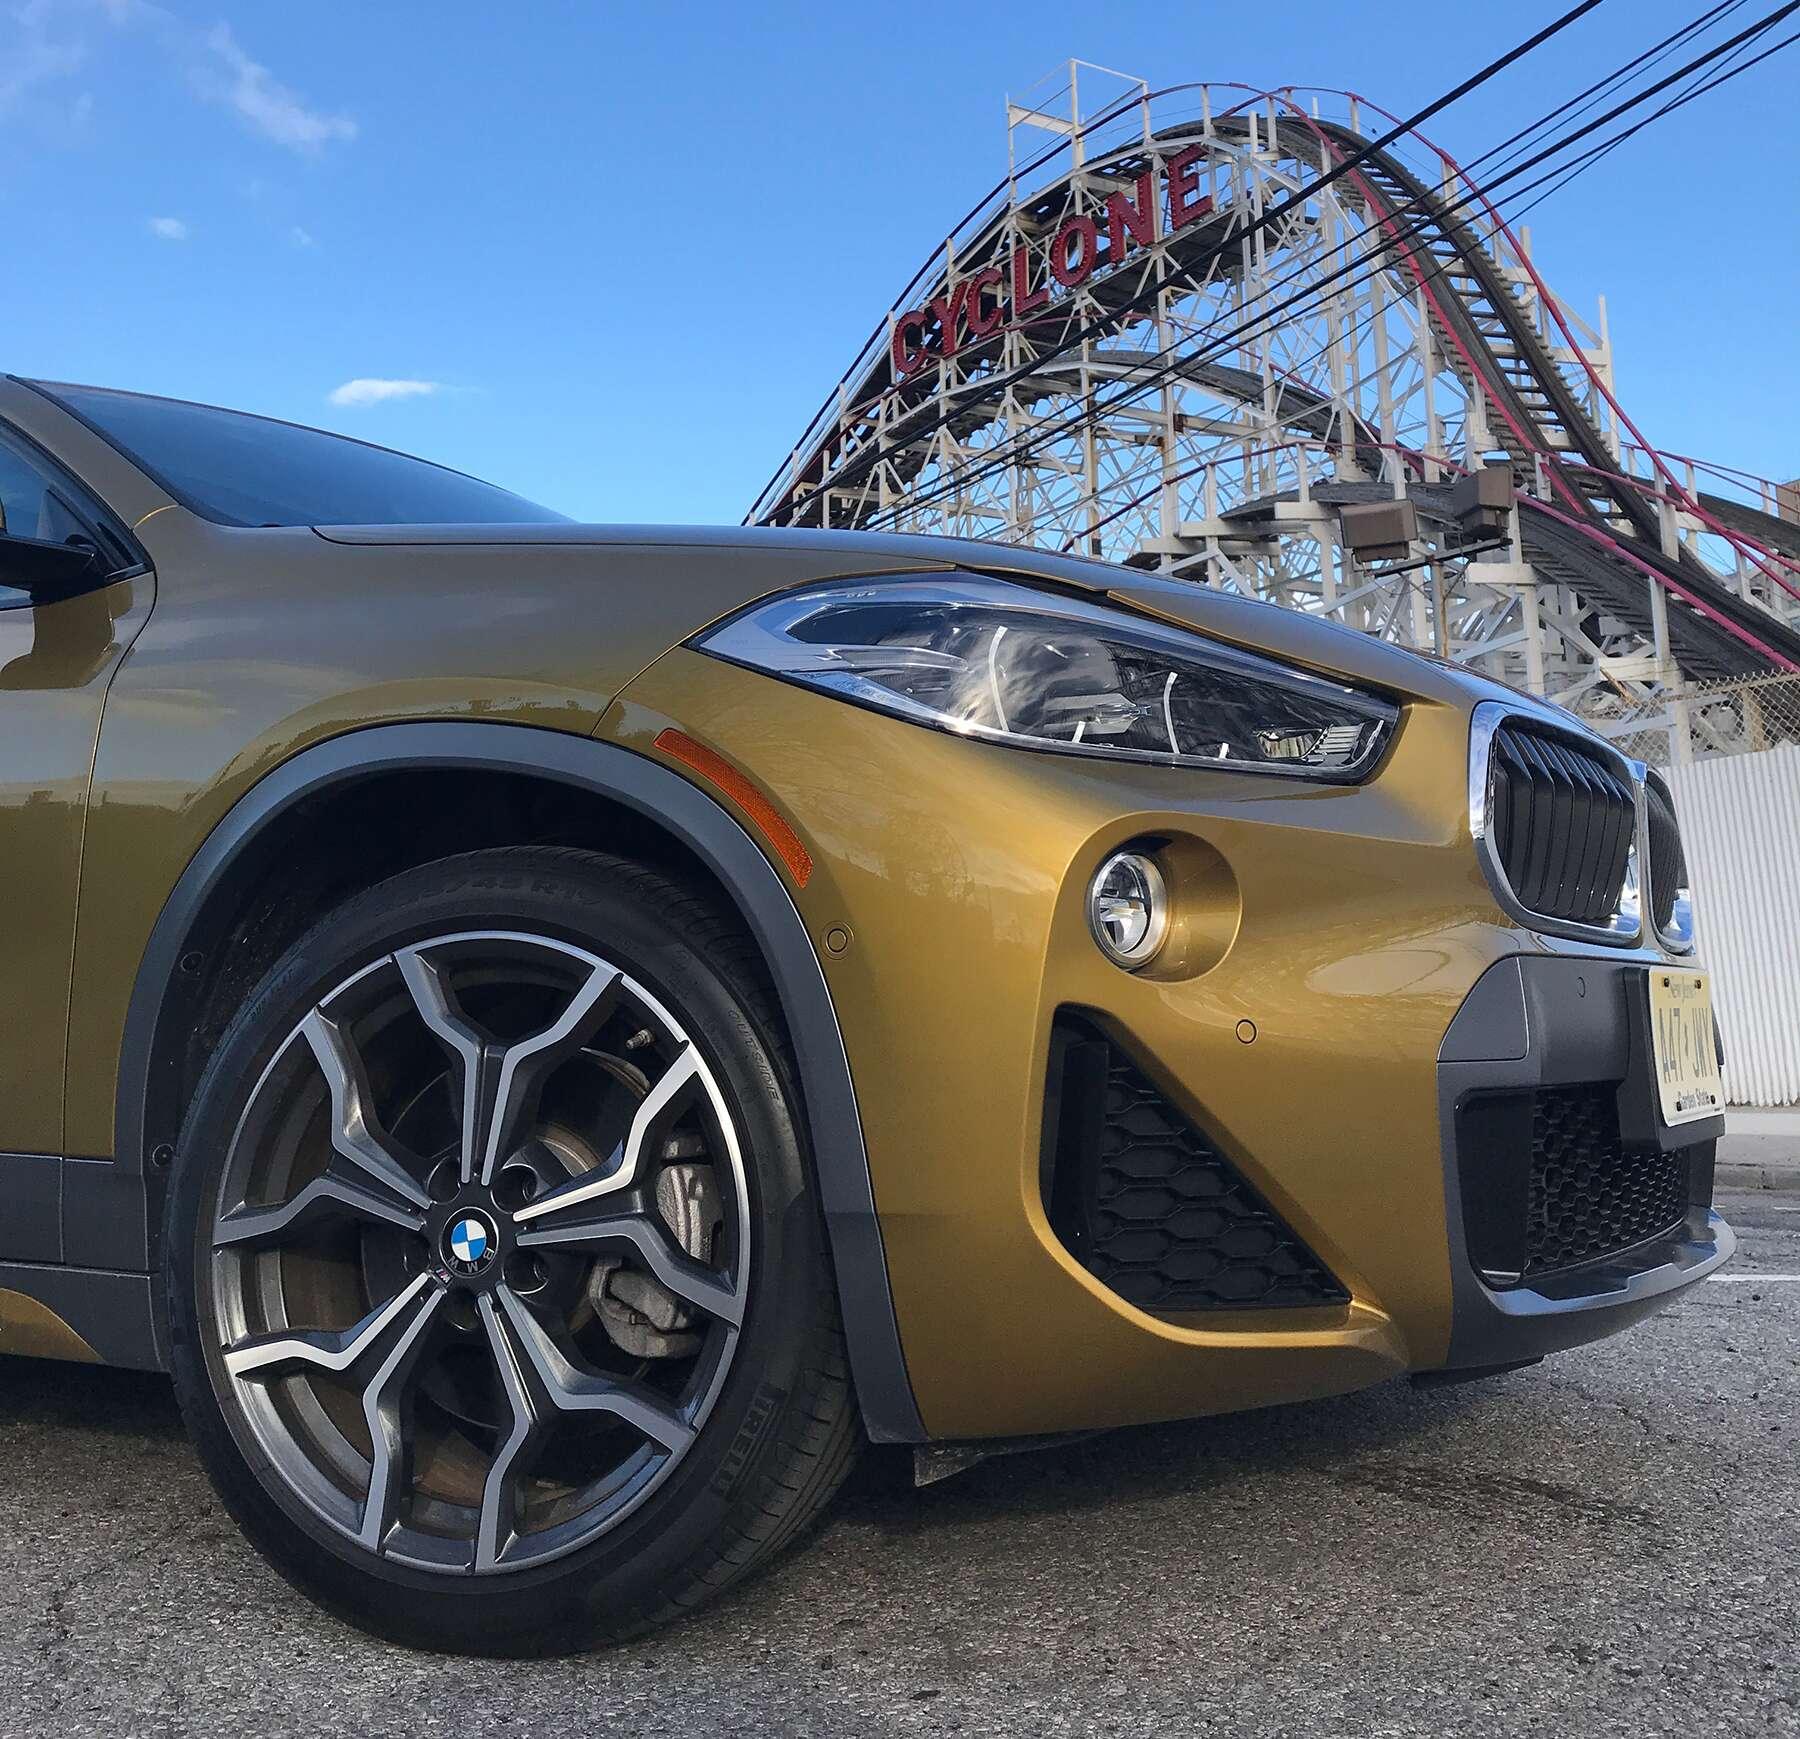 2018 BMW X2 XDrive28i Review: A Sporty Subcompact